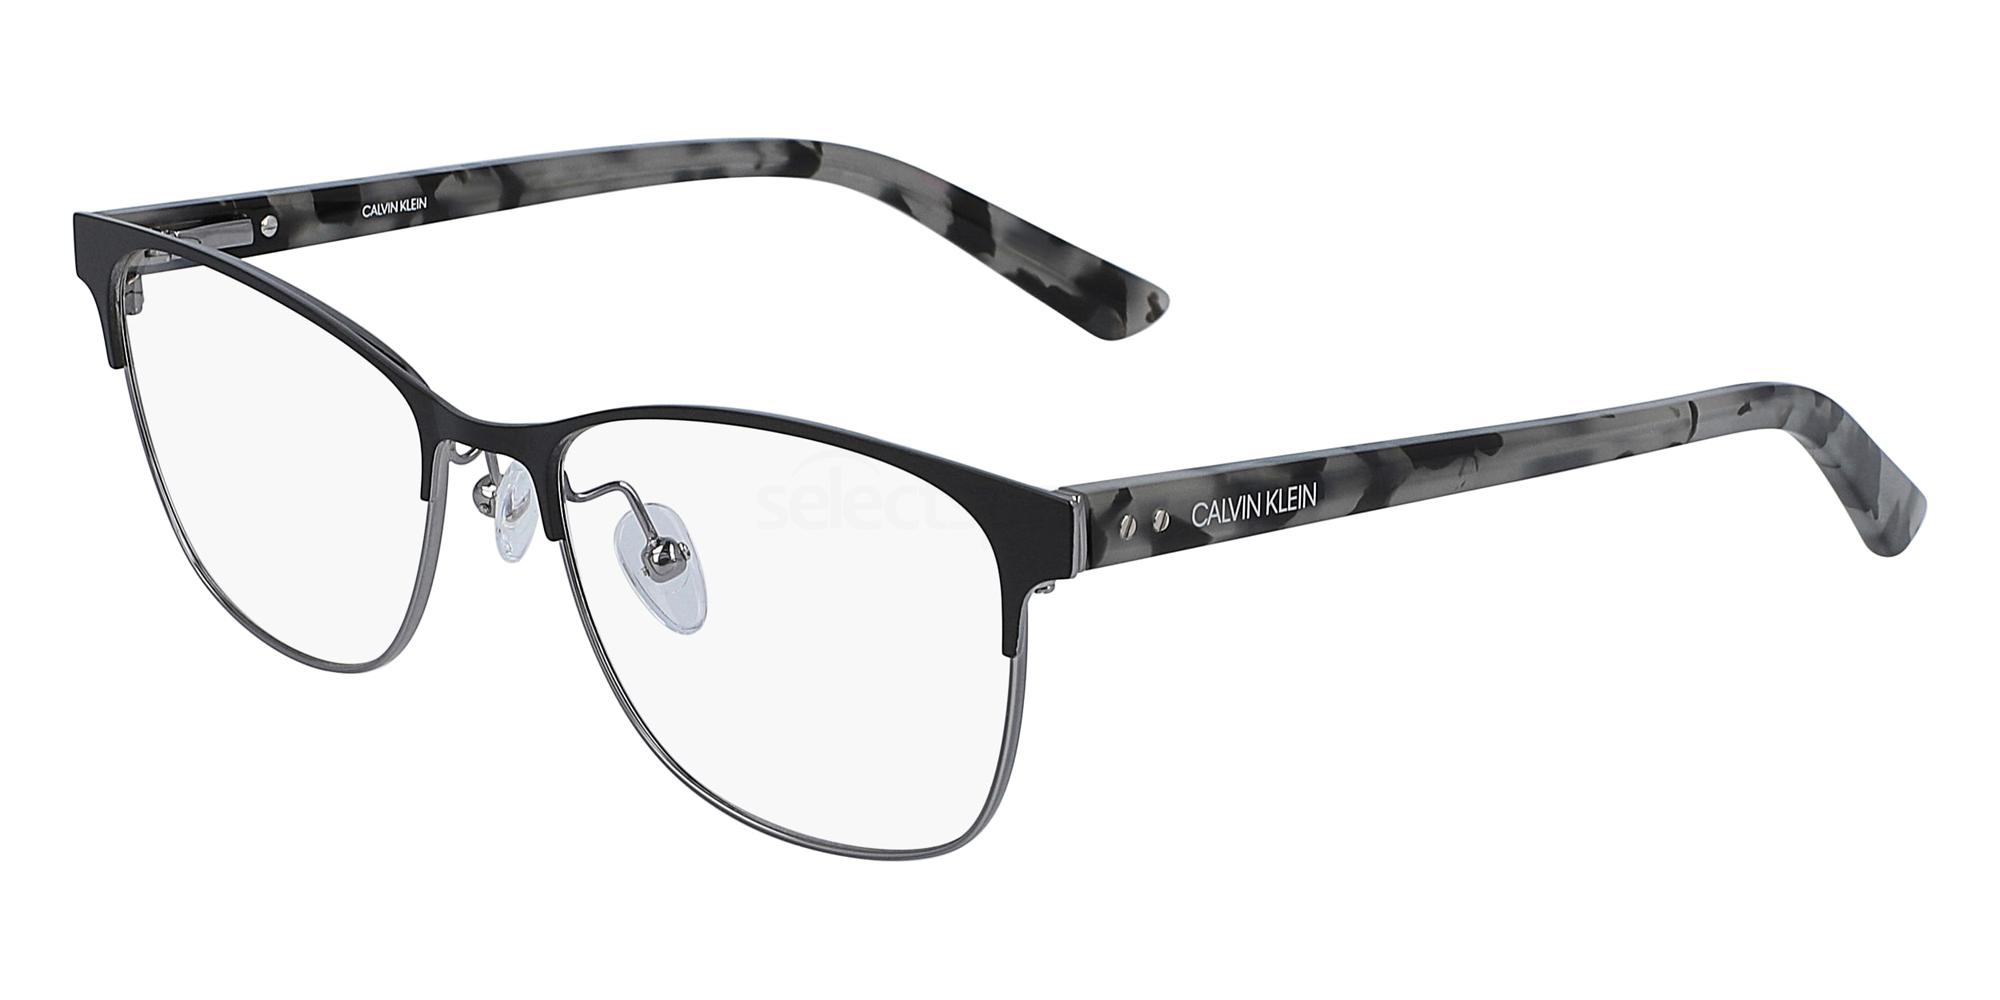 001 CK19305 Glasses, Calvin Klein